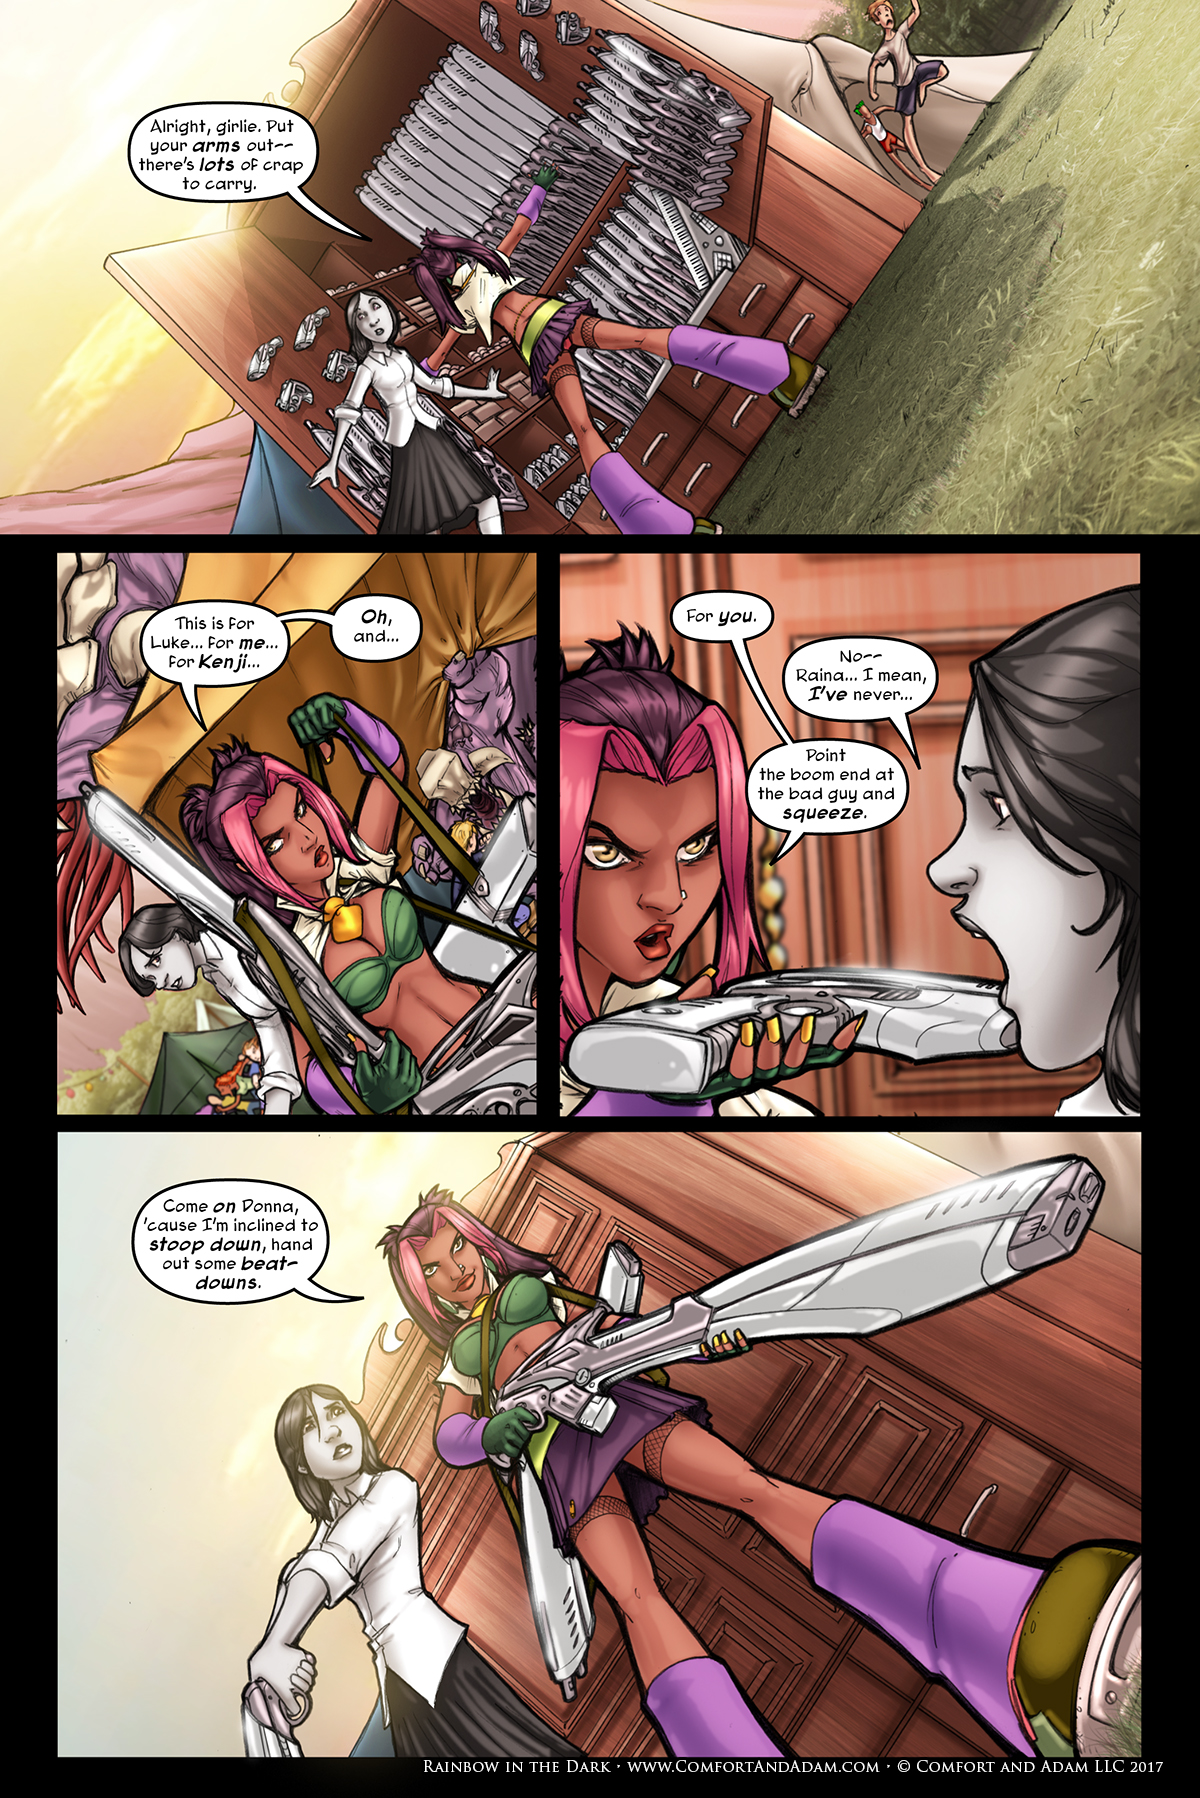 Rainbow in the Dark #2, pg. 18: Arm Yourself